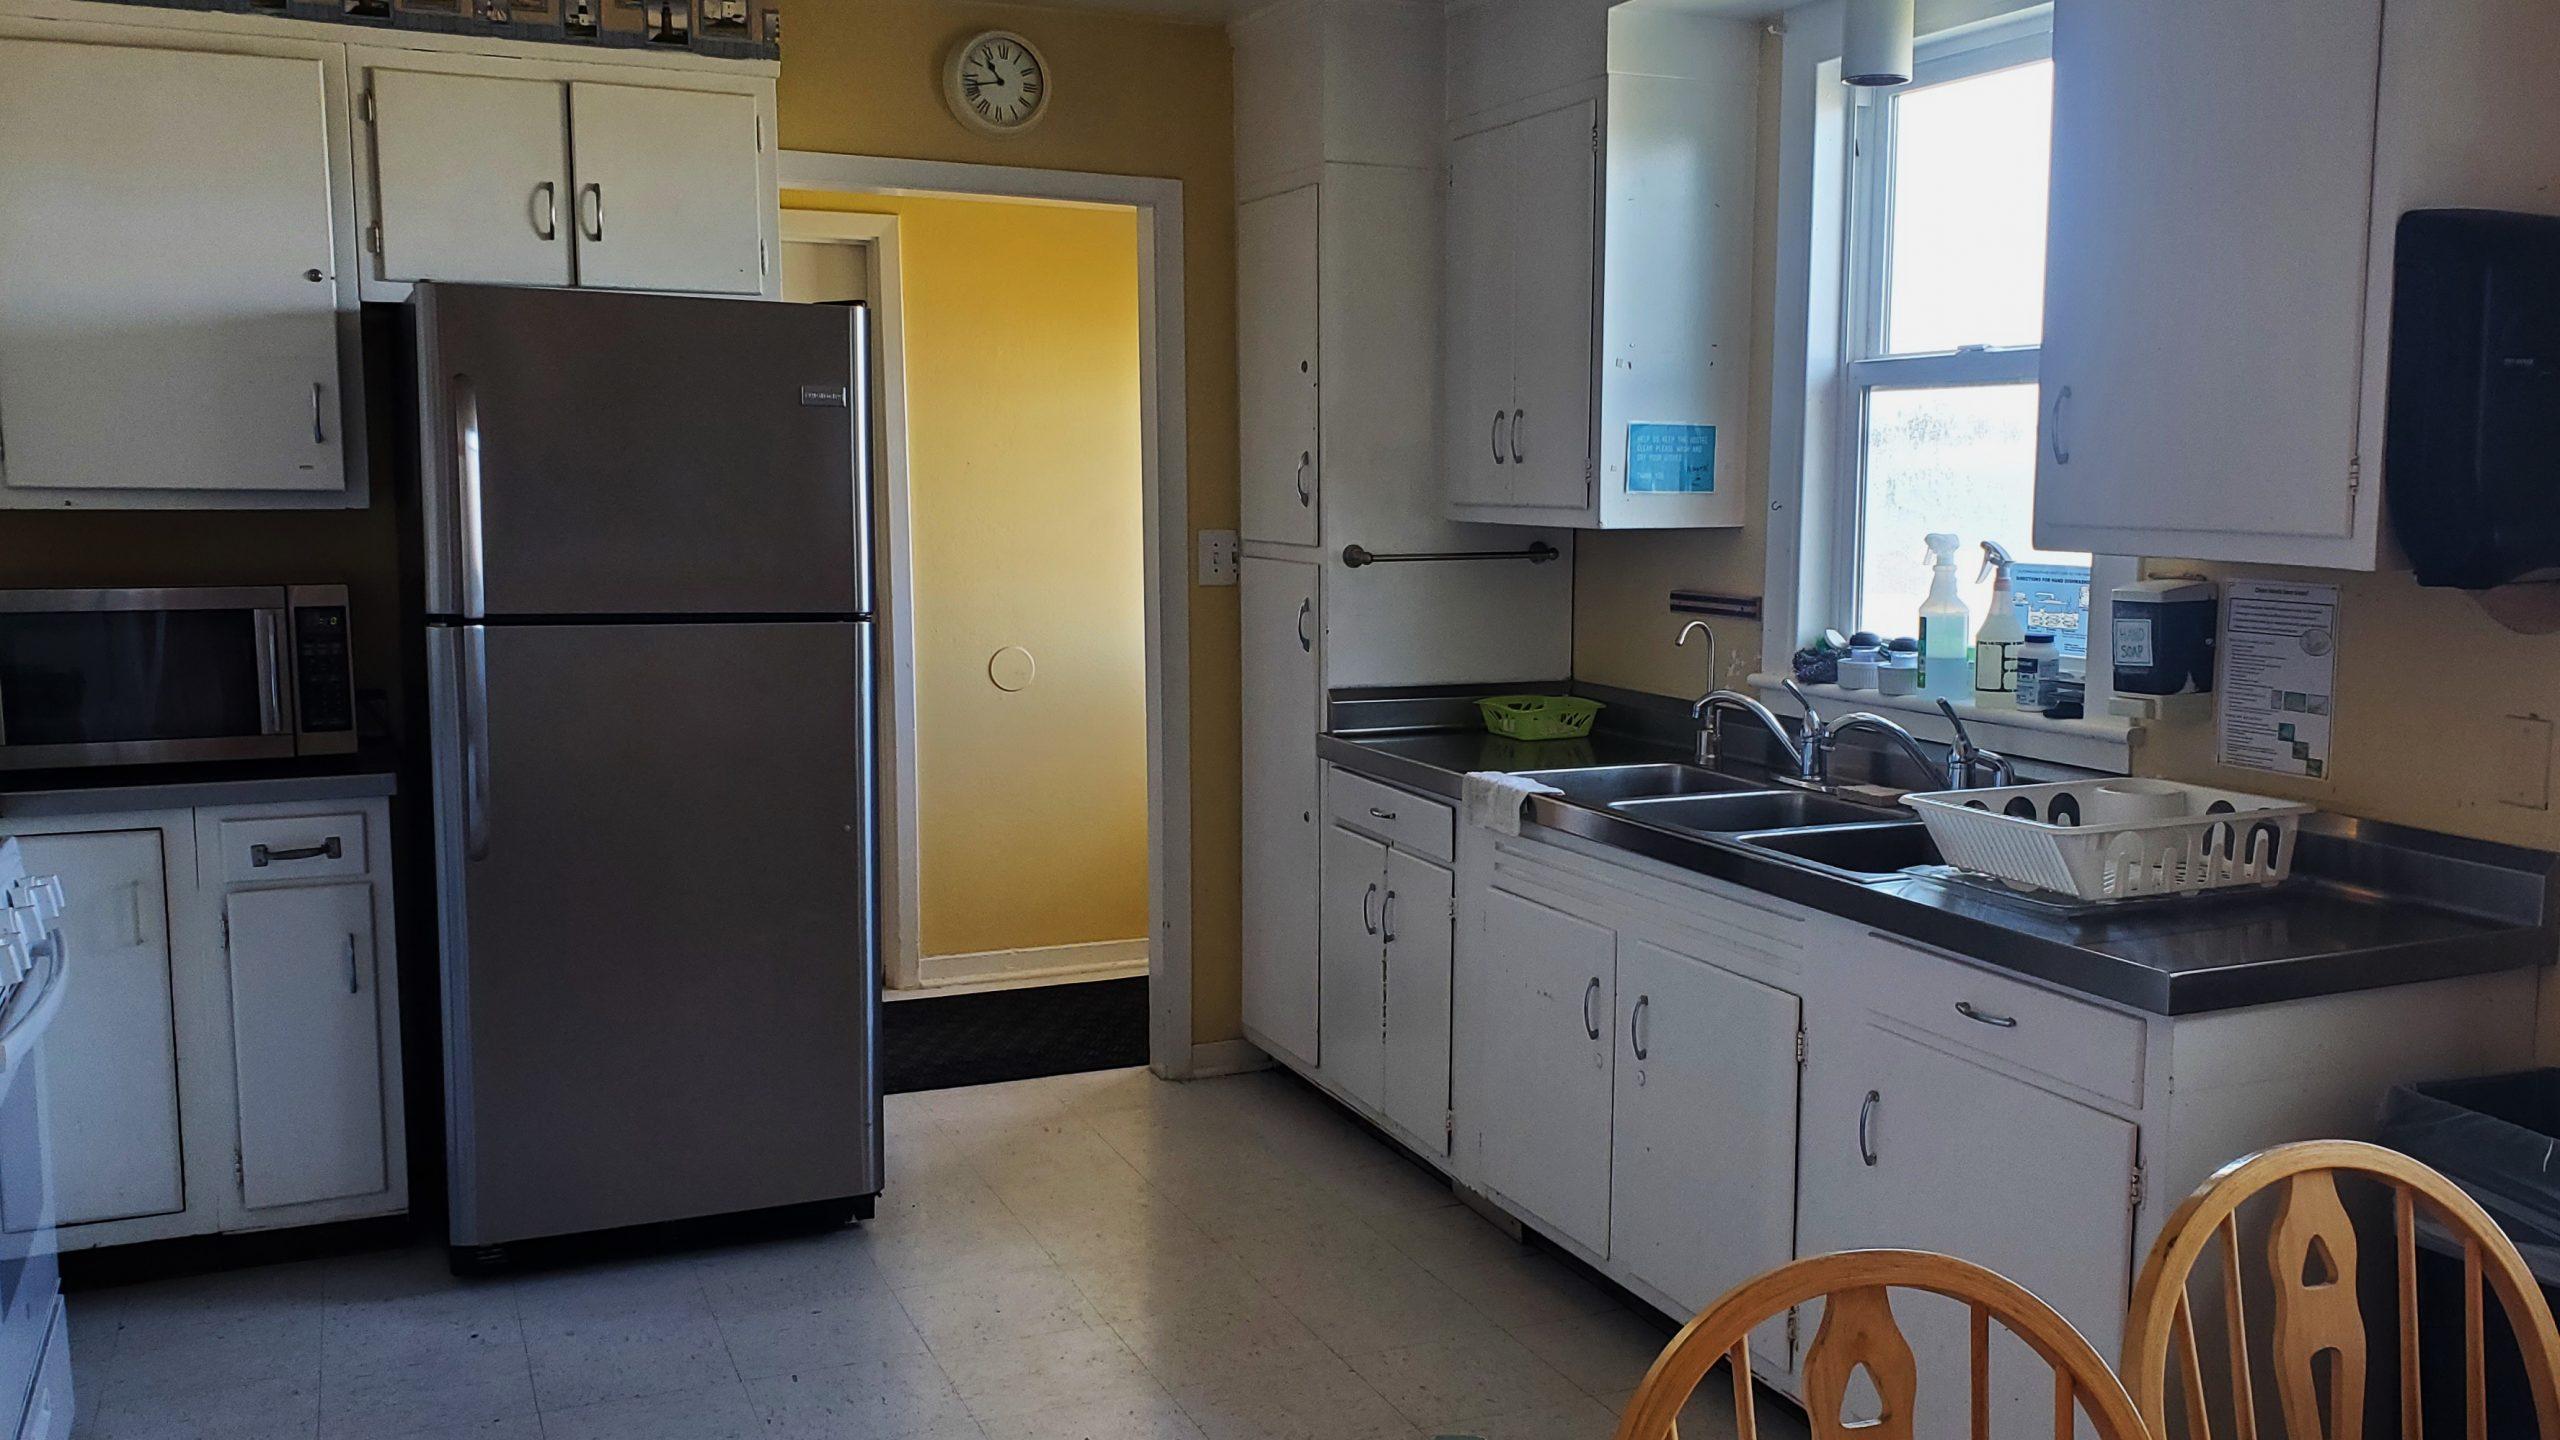 Kitchen in the Pigeon Point lightouse hostel unit